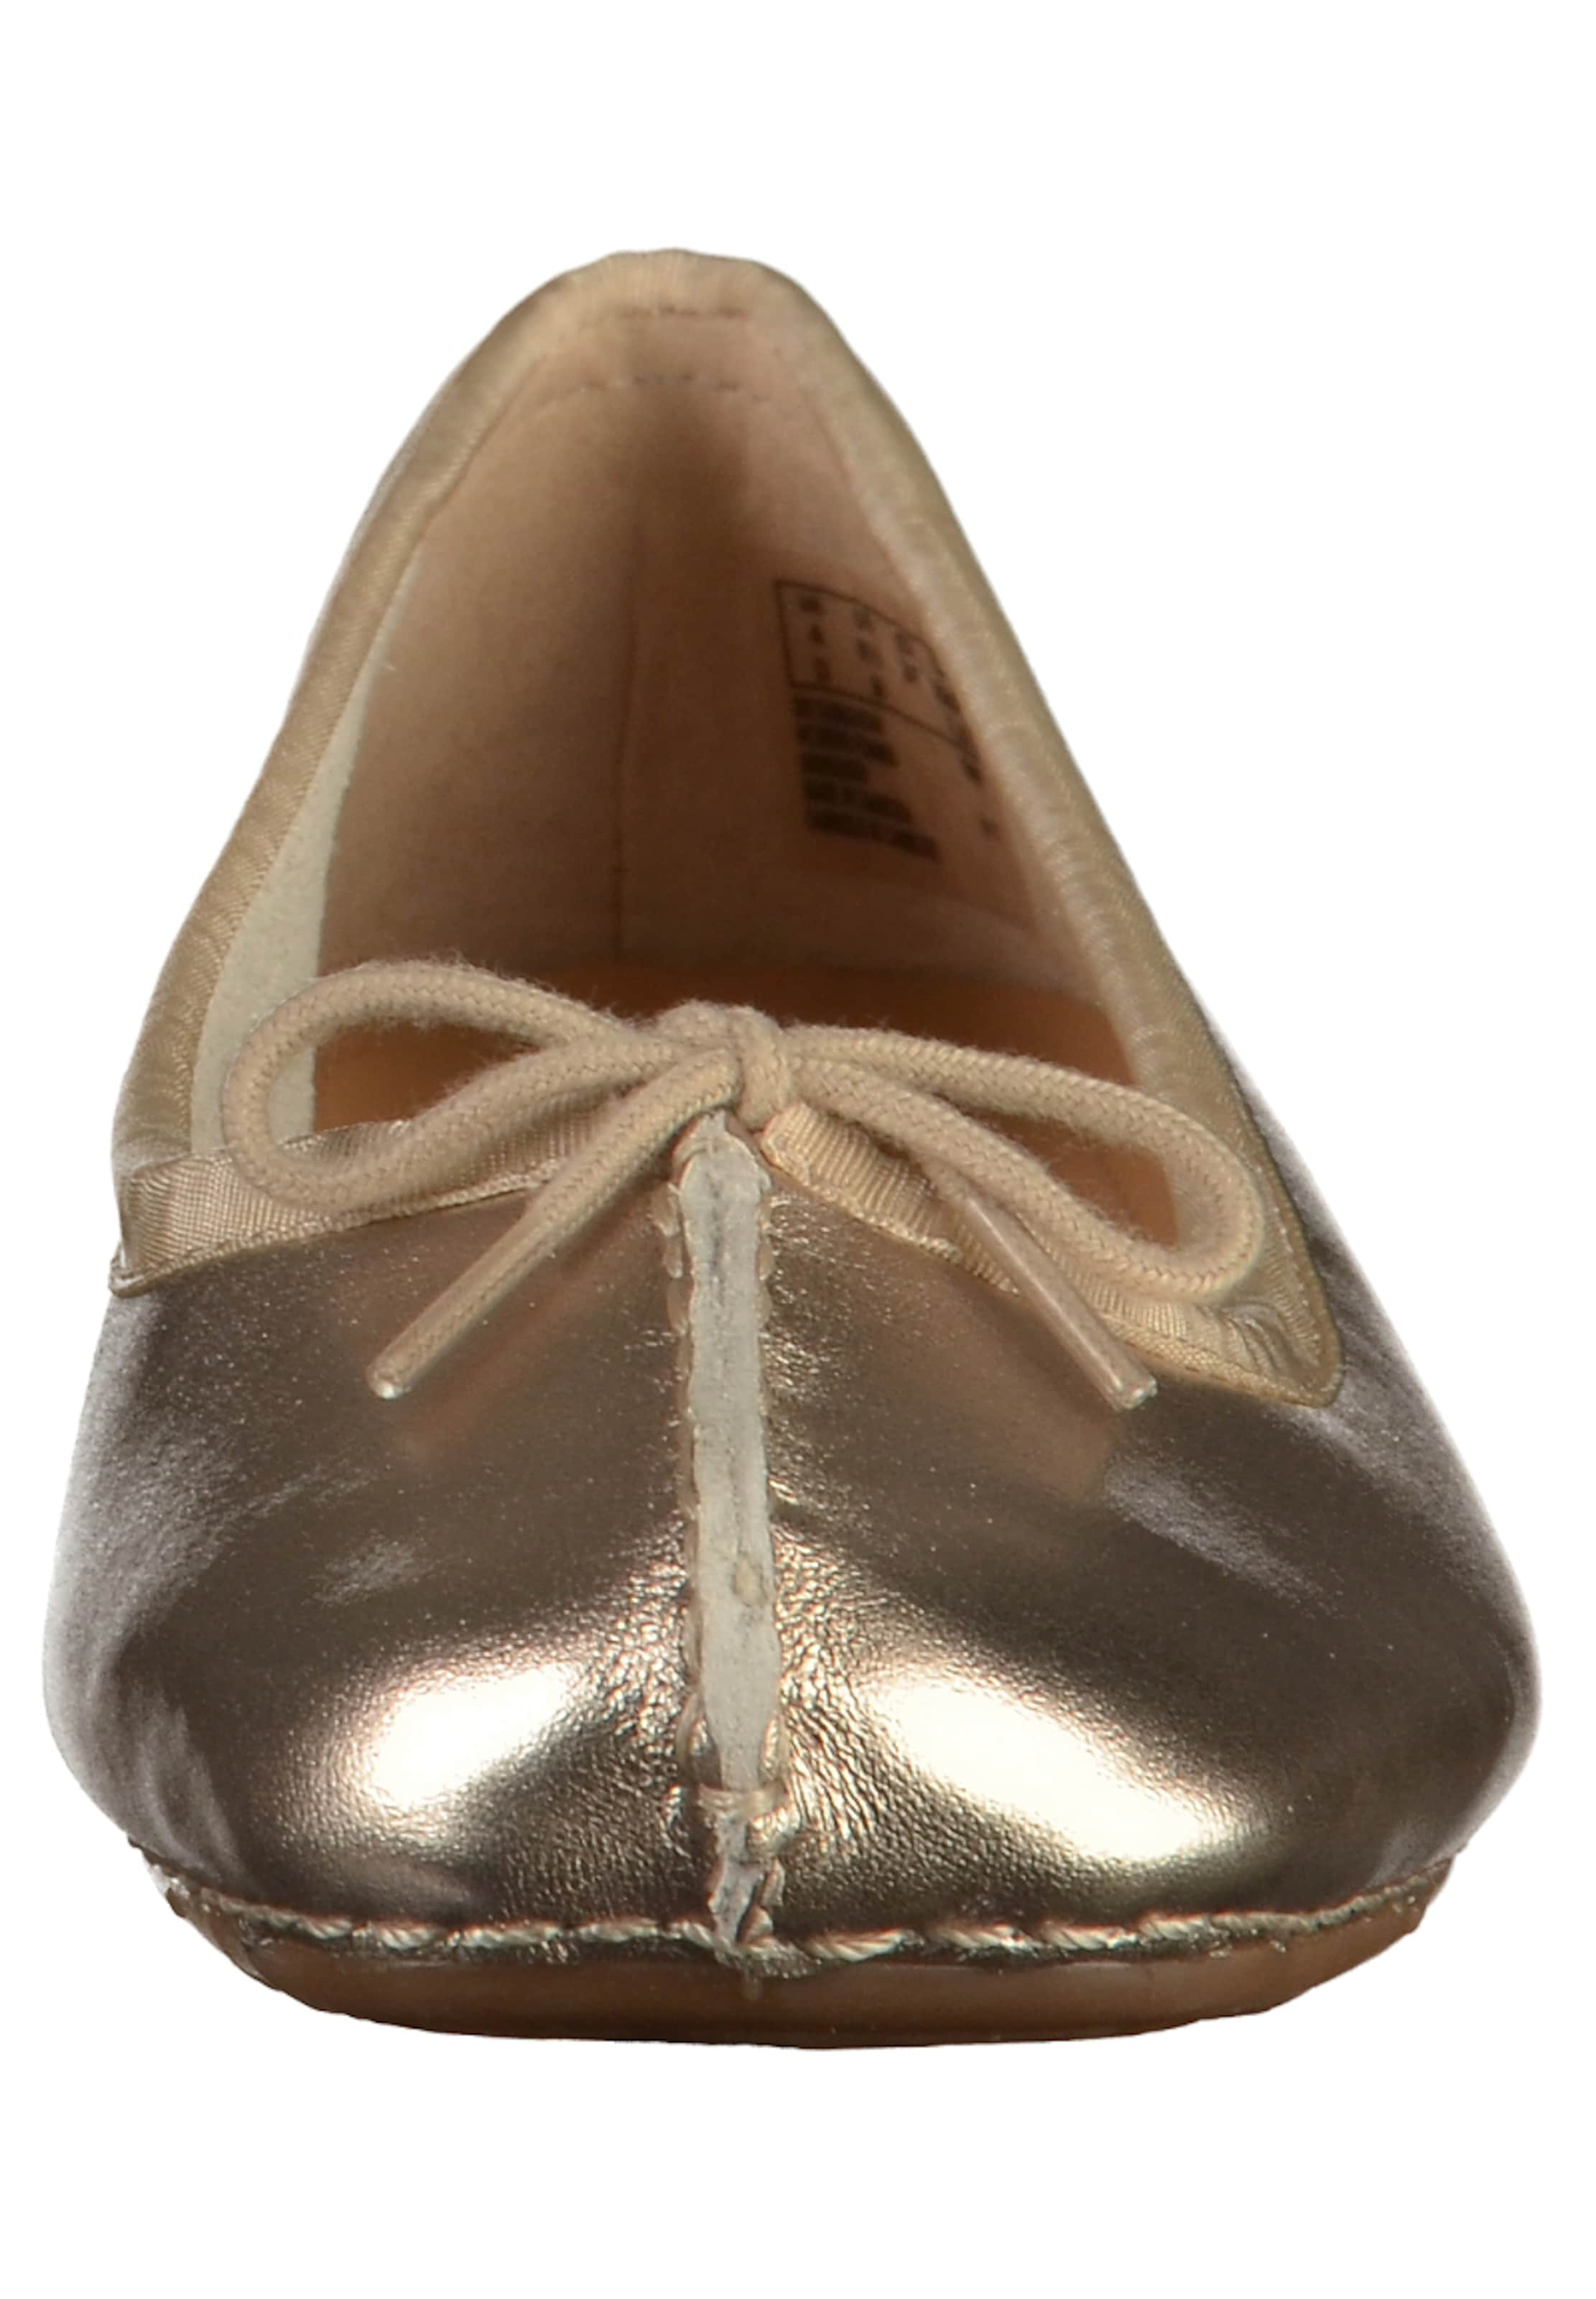 ice' 'Freckle Ballerina CLARKS Leder aus CLARKS Ballerina W6vPvn